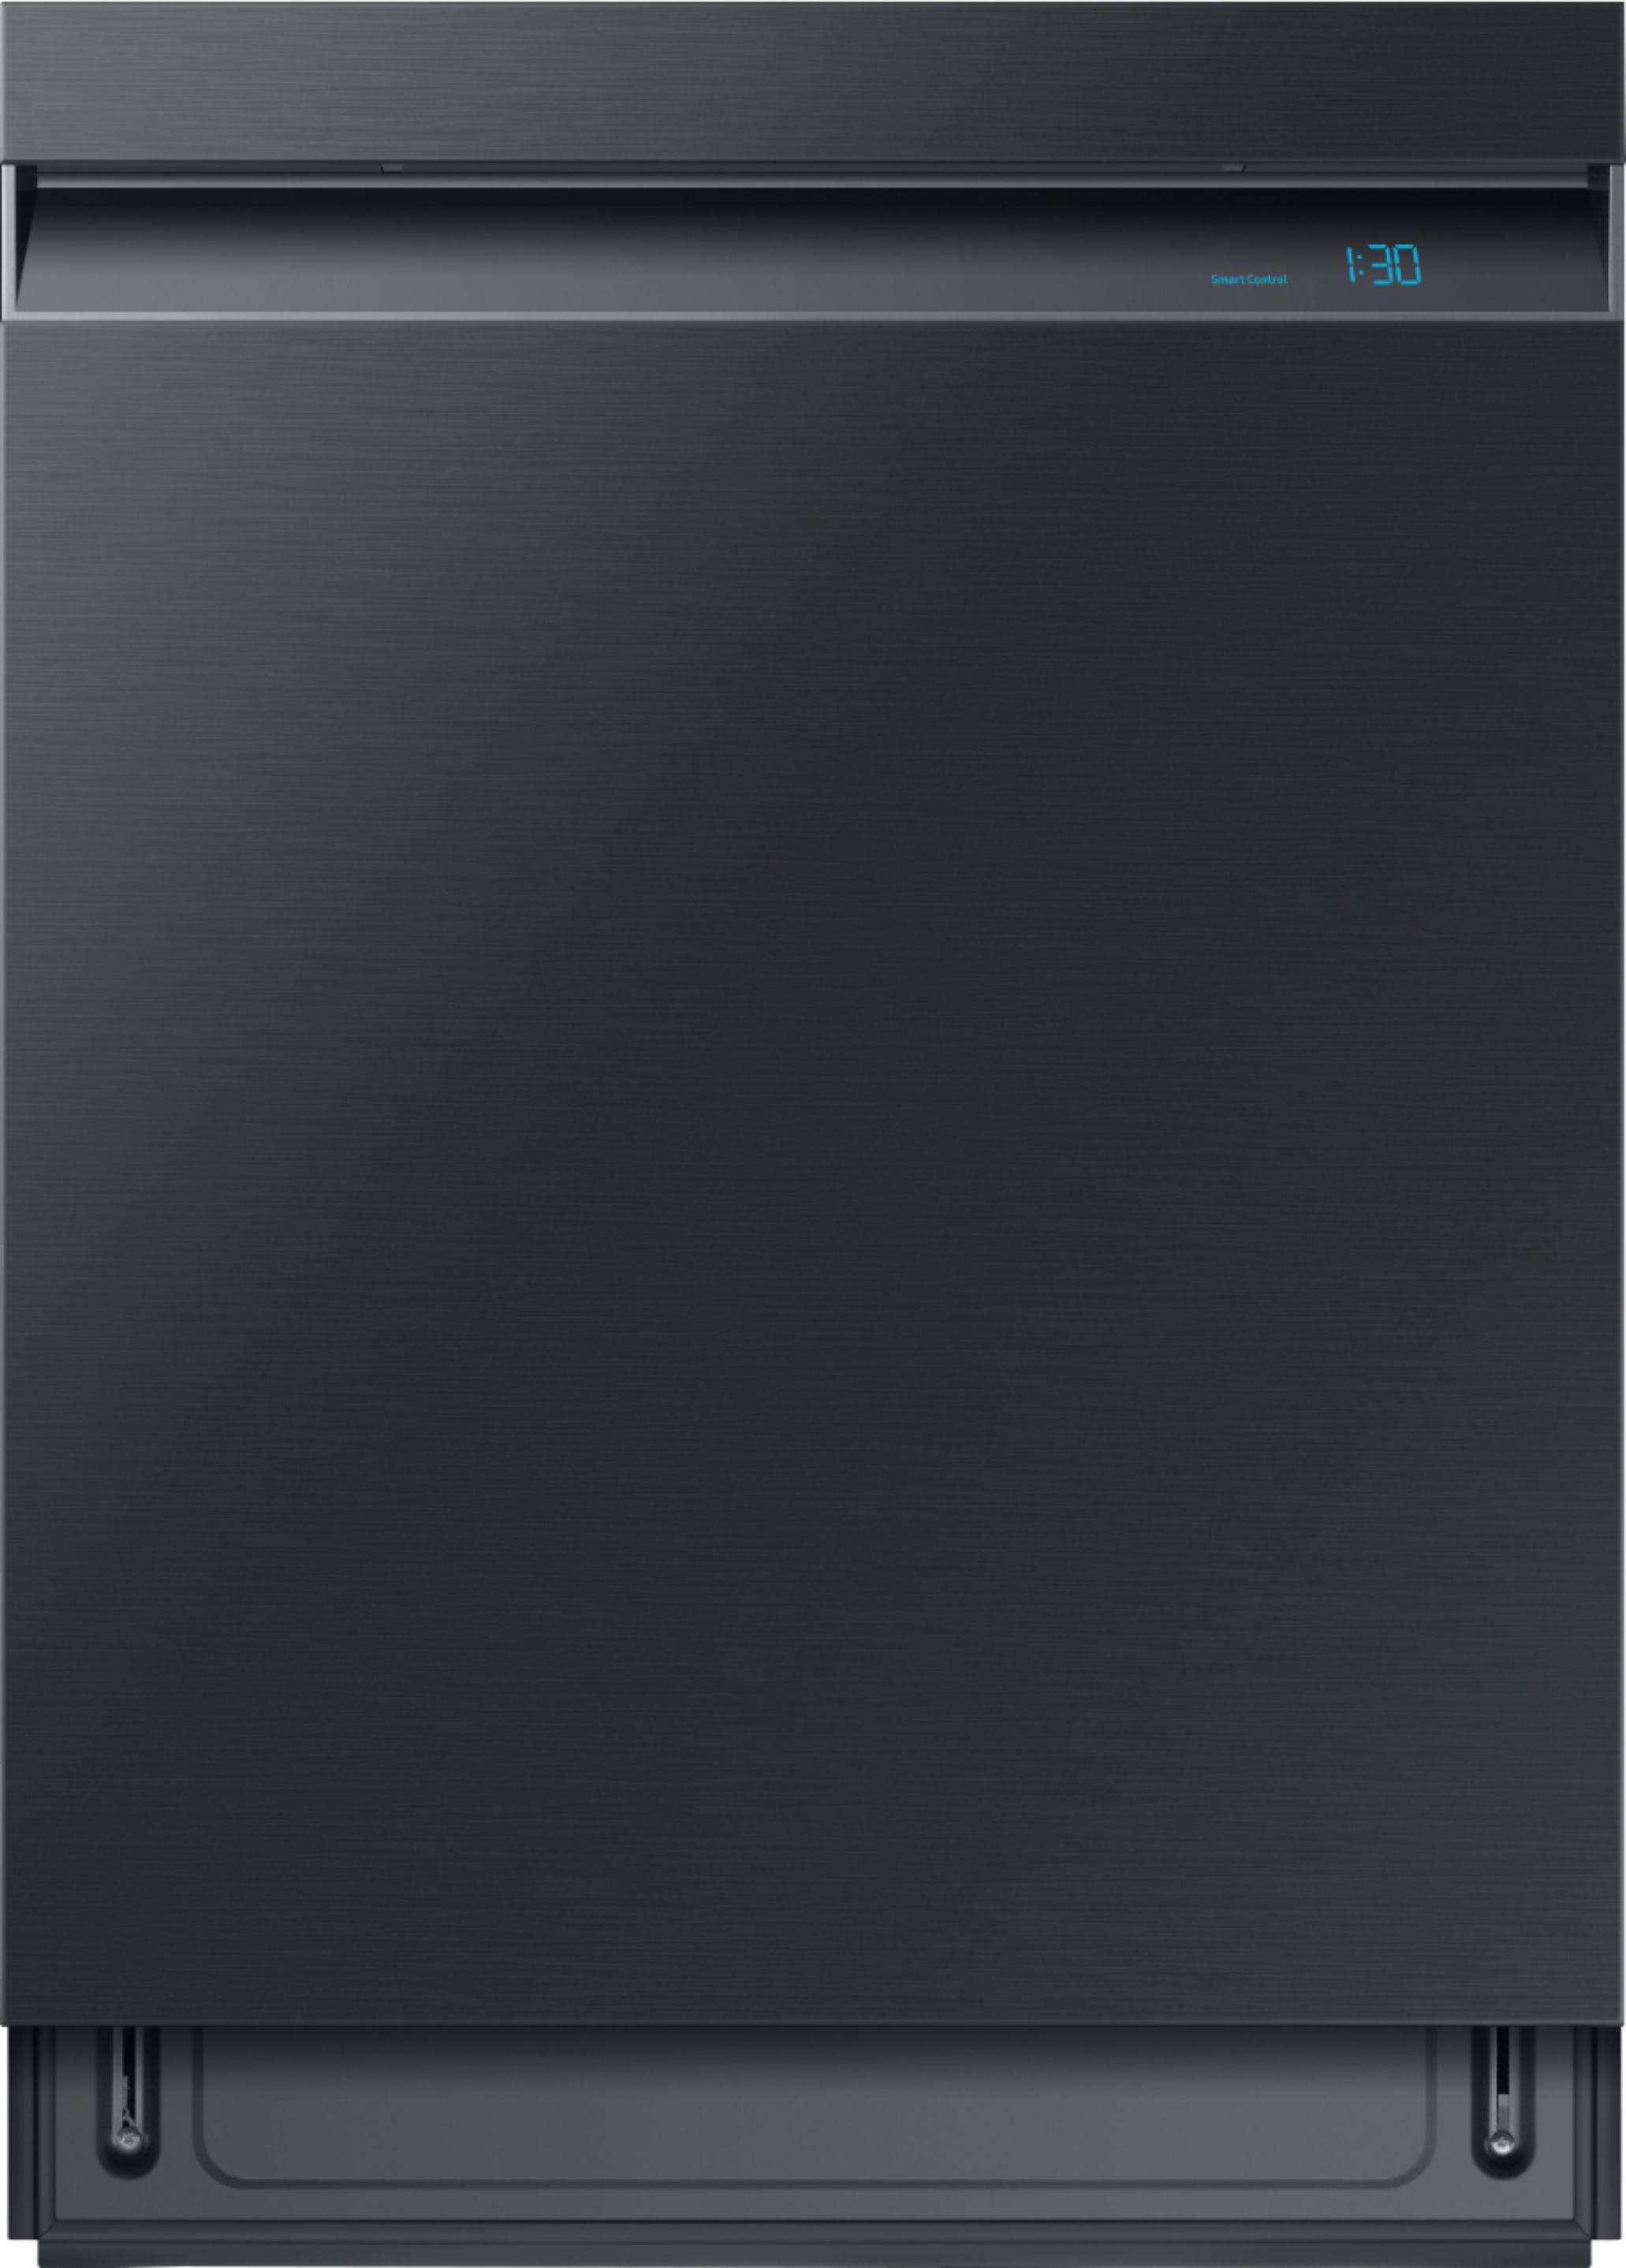 Samsung Dishwasher Kick Plate : samsung, dishwasher, plate, Samsung, Linear, Control, Built-In, Dishwasher, AutoRelease, Fingerprint, Resistant, Black, Stainless, Steel, DW80R9950UG